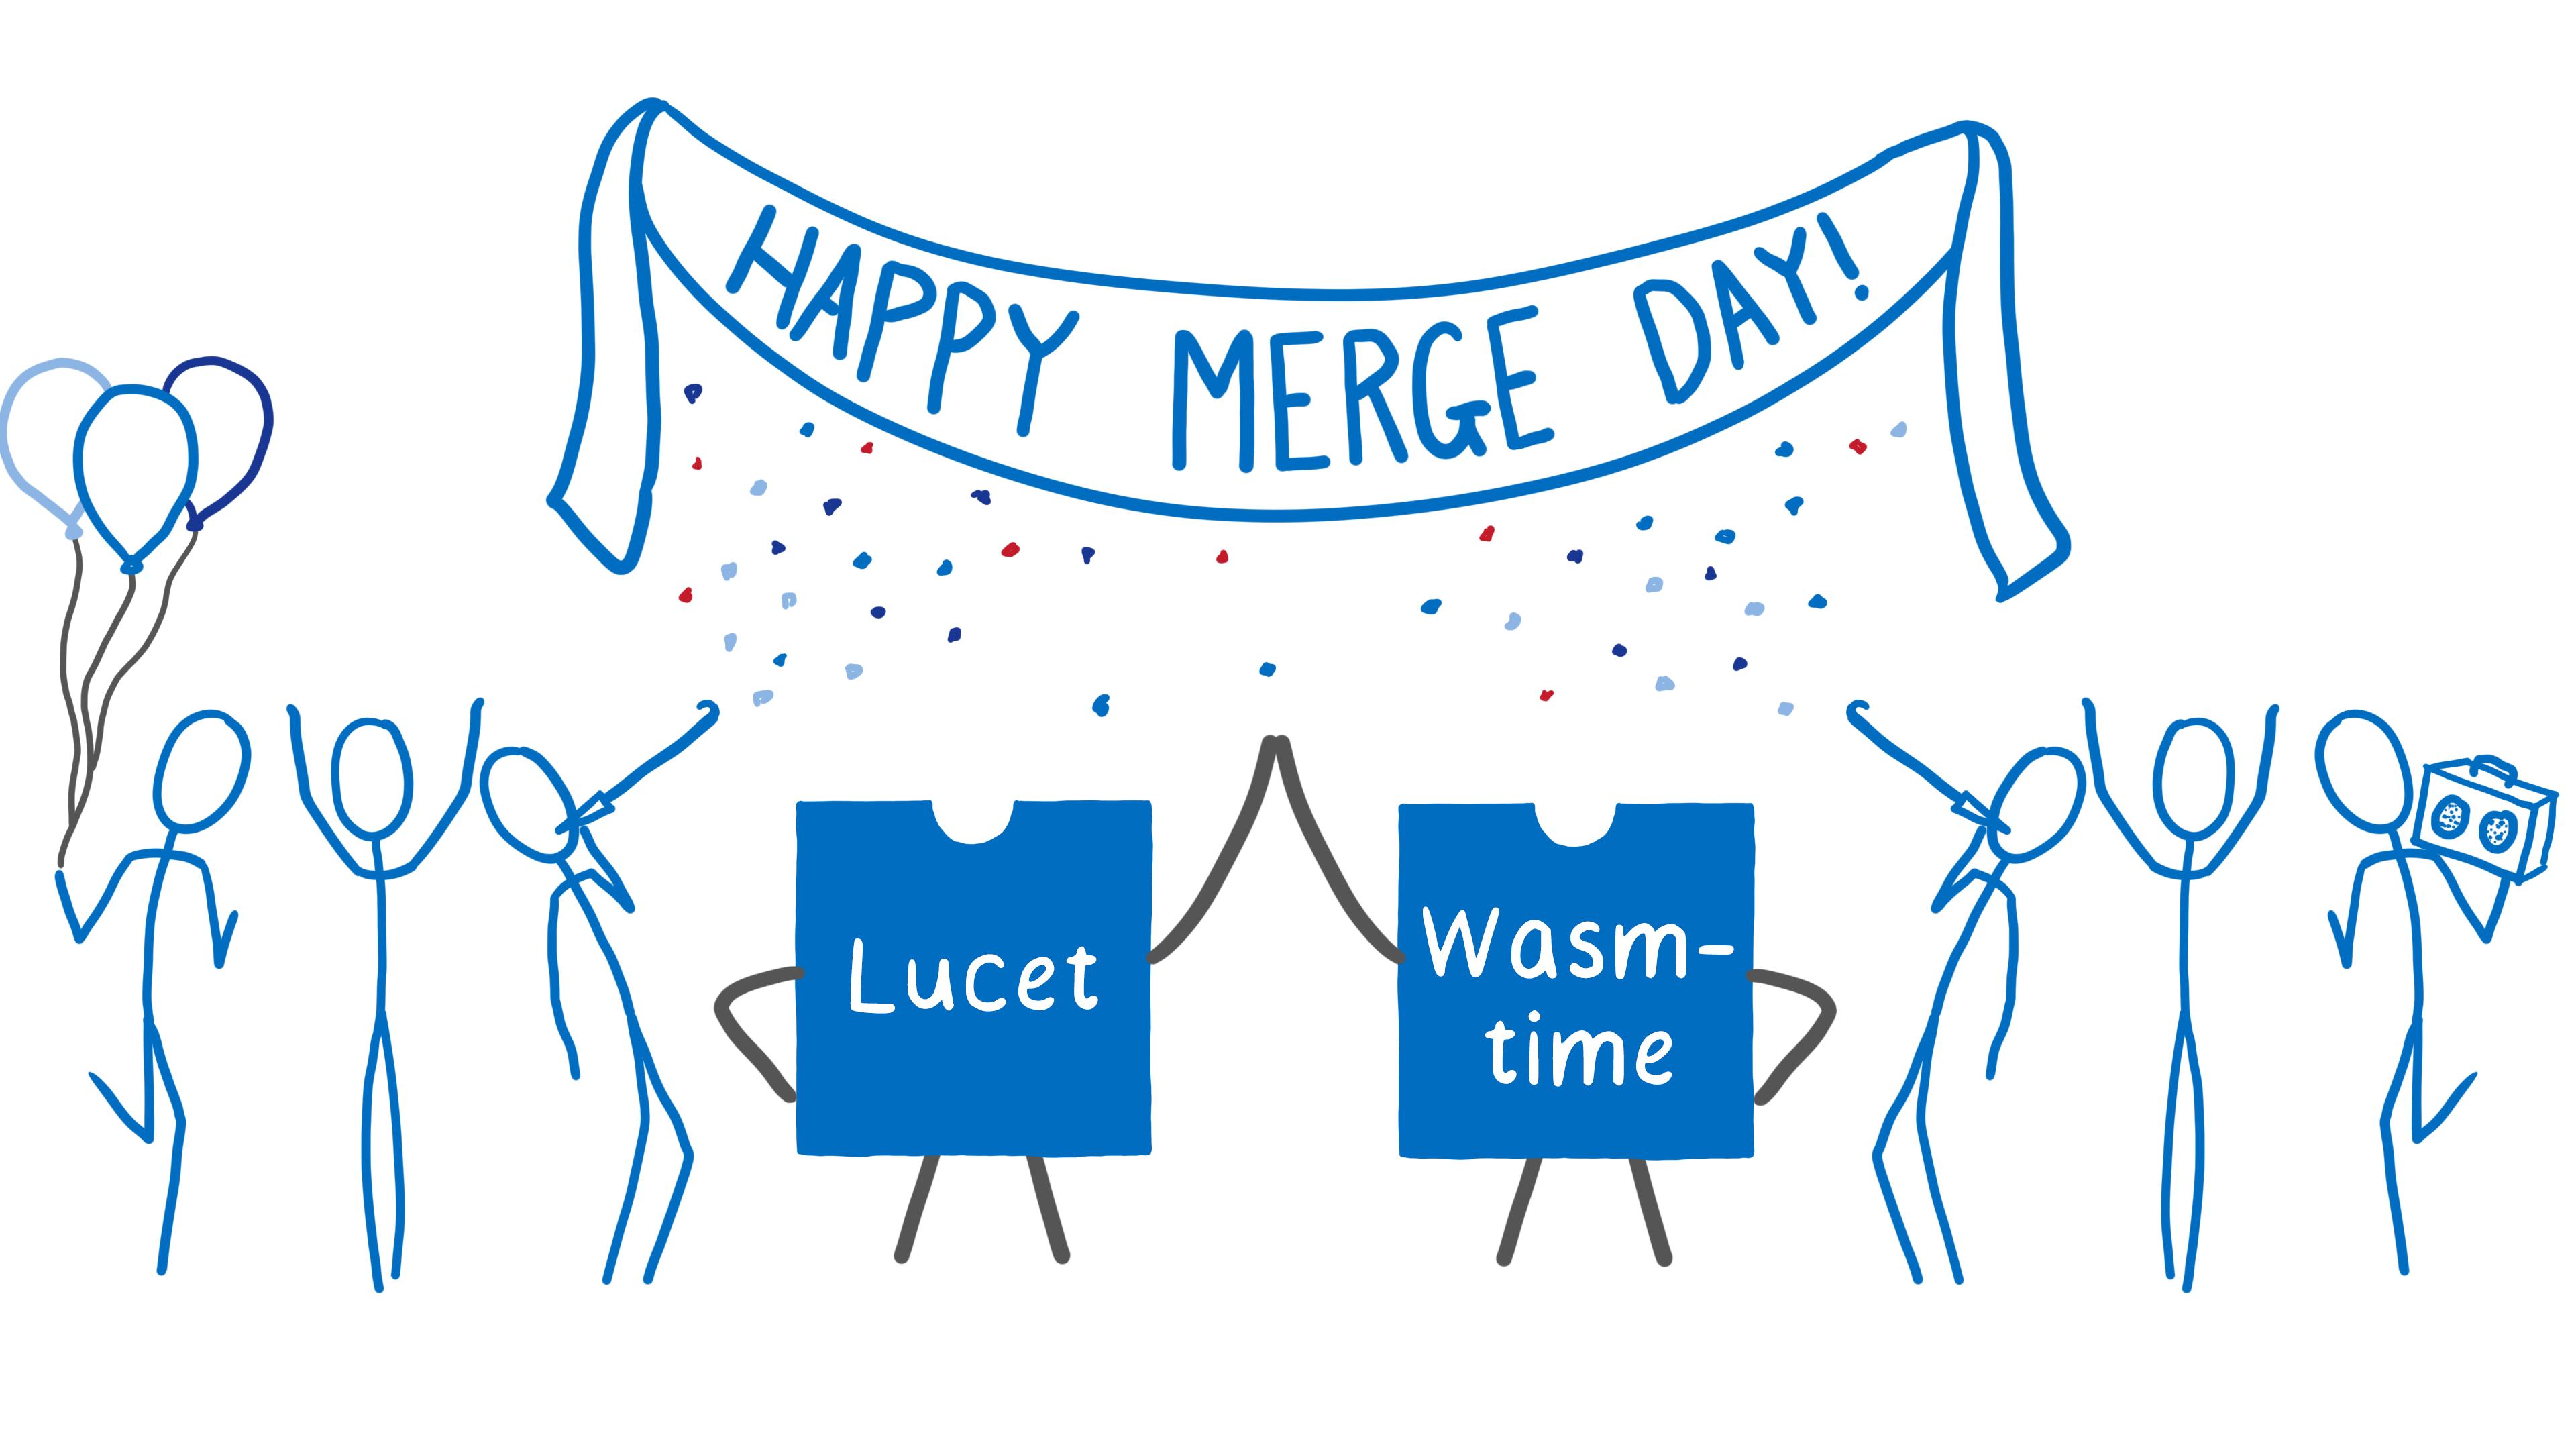 merge day